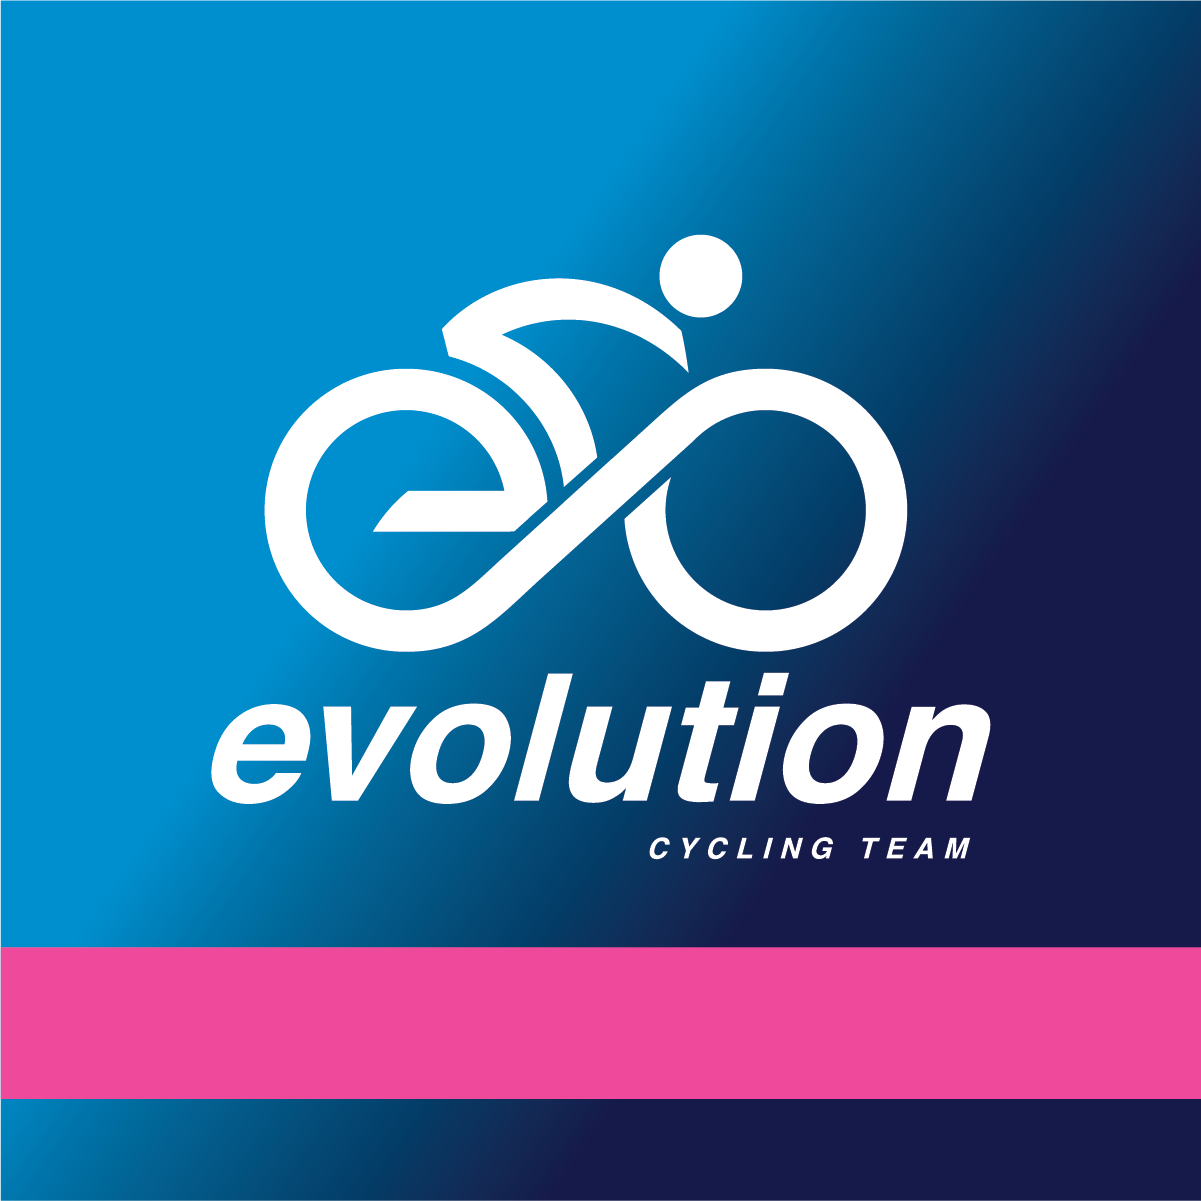 Evolution Cycling Club